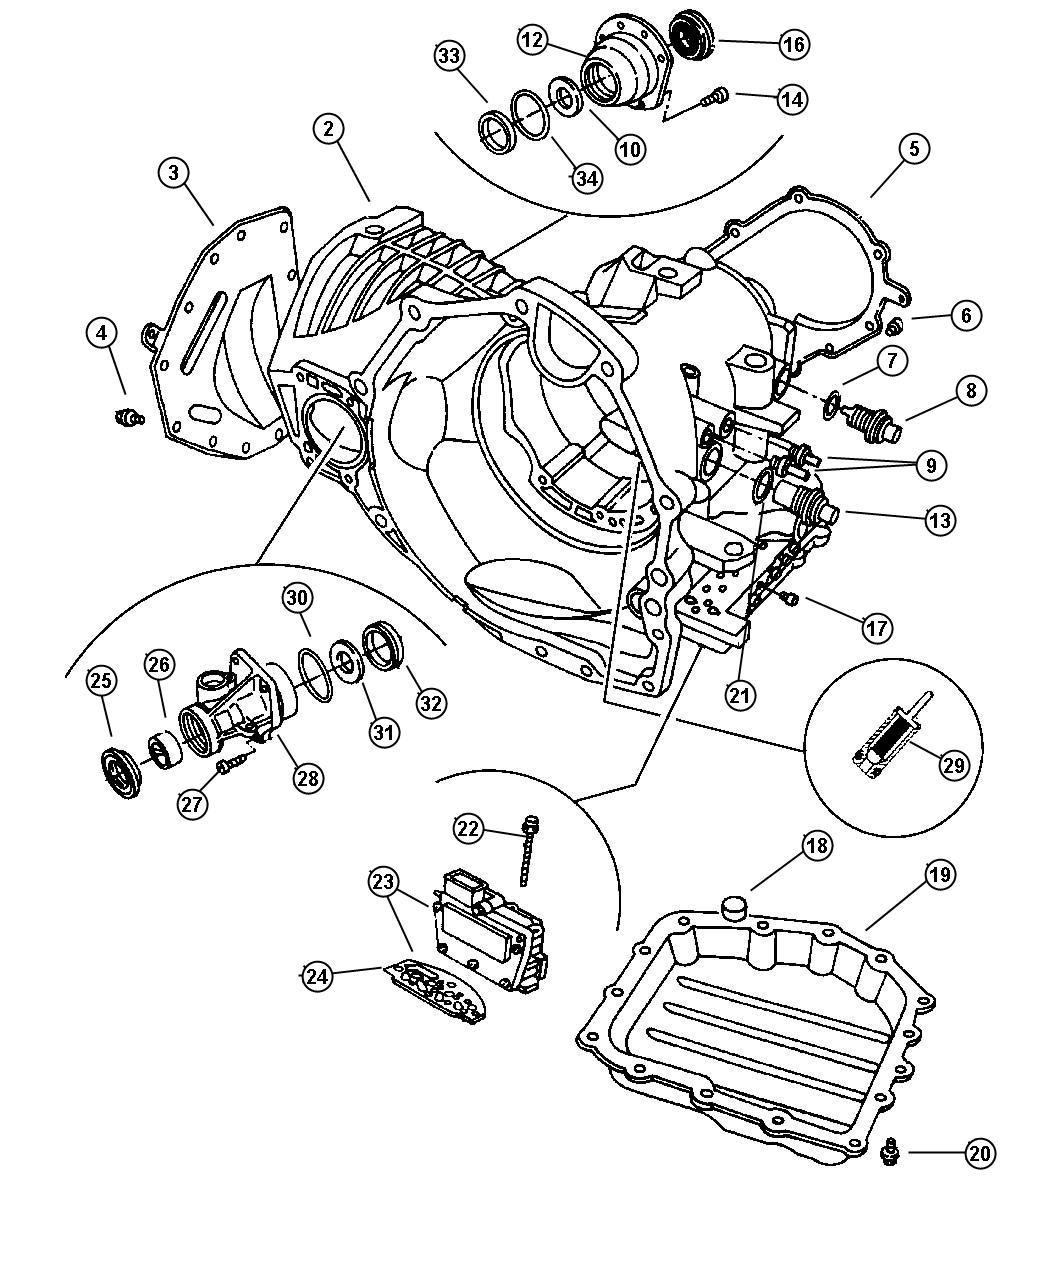 Chrysler Town  U0026 Country Solenoid Module  Solenoid Package  41te Transaxle  Transmission  Valve